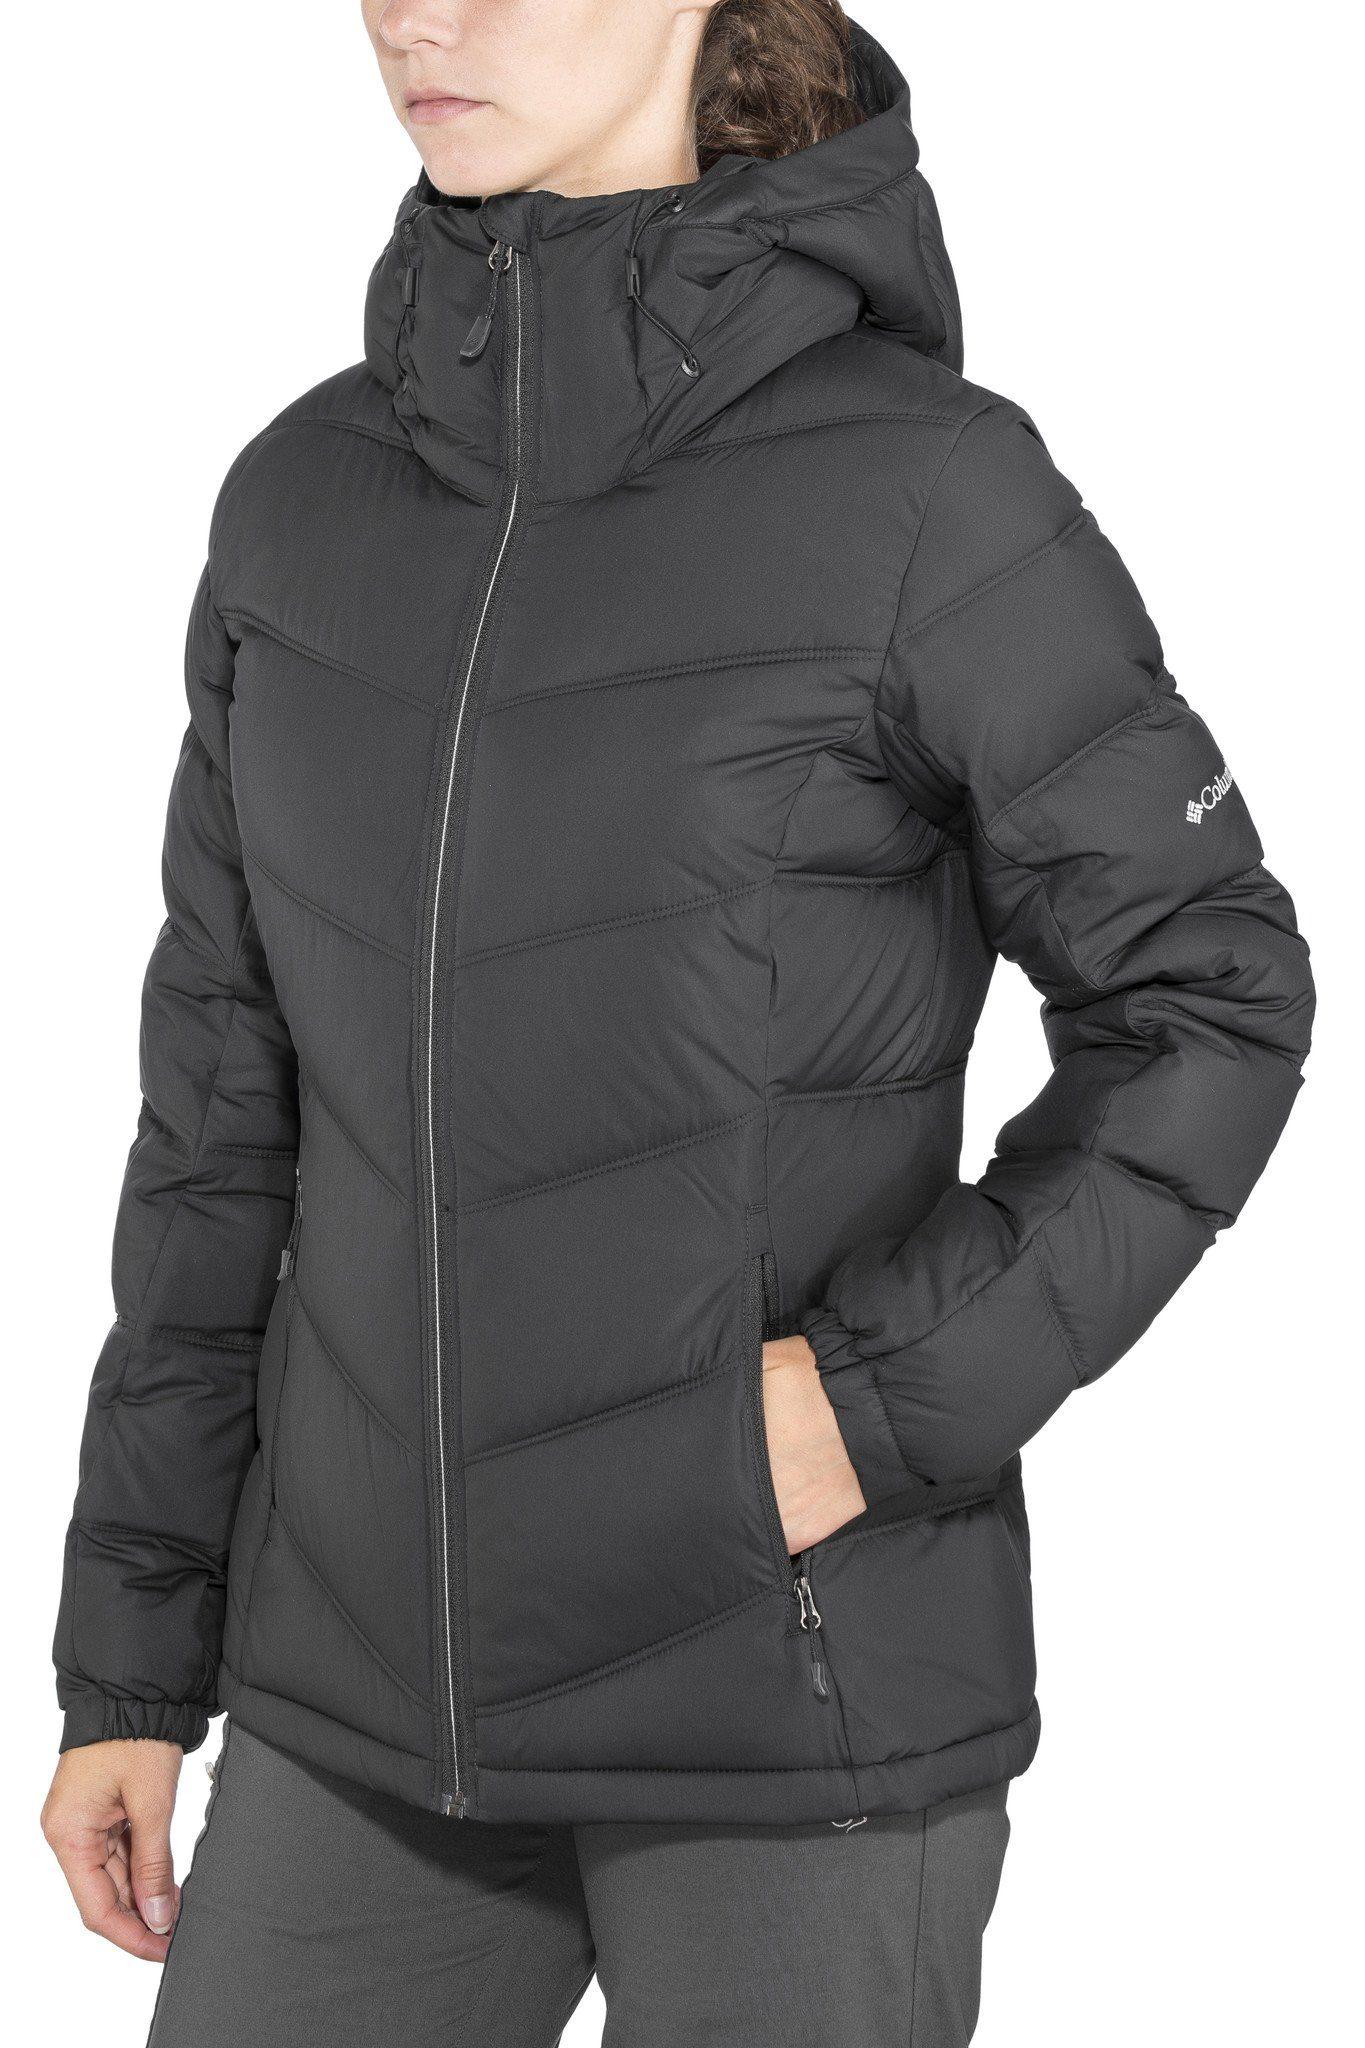 Columbia Outdoorjacke »Pike Lake Hooded Jacket Damen«, Modelljahr 2019 online kaufen   OTTO